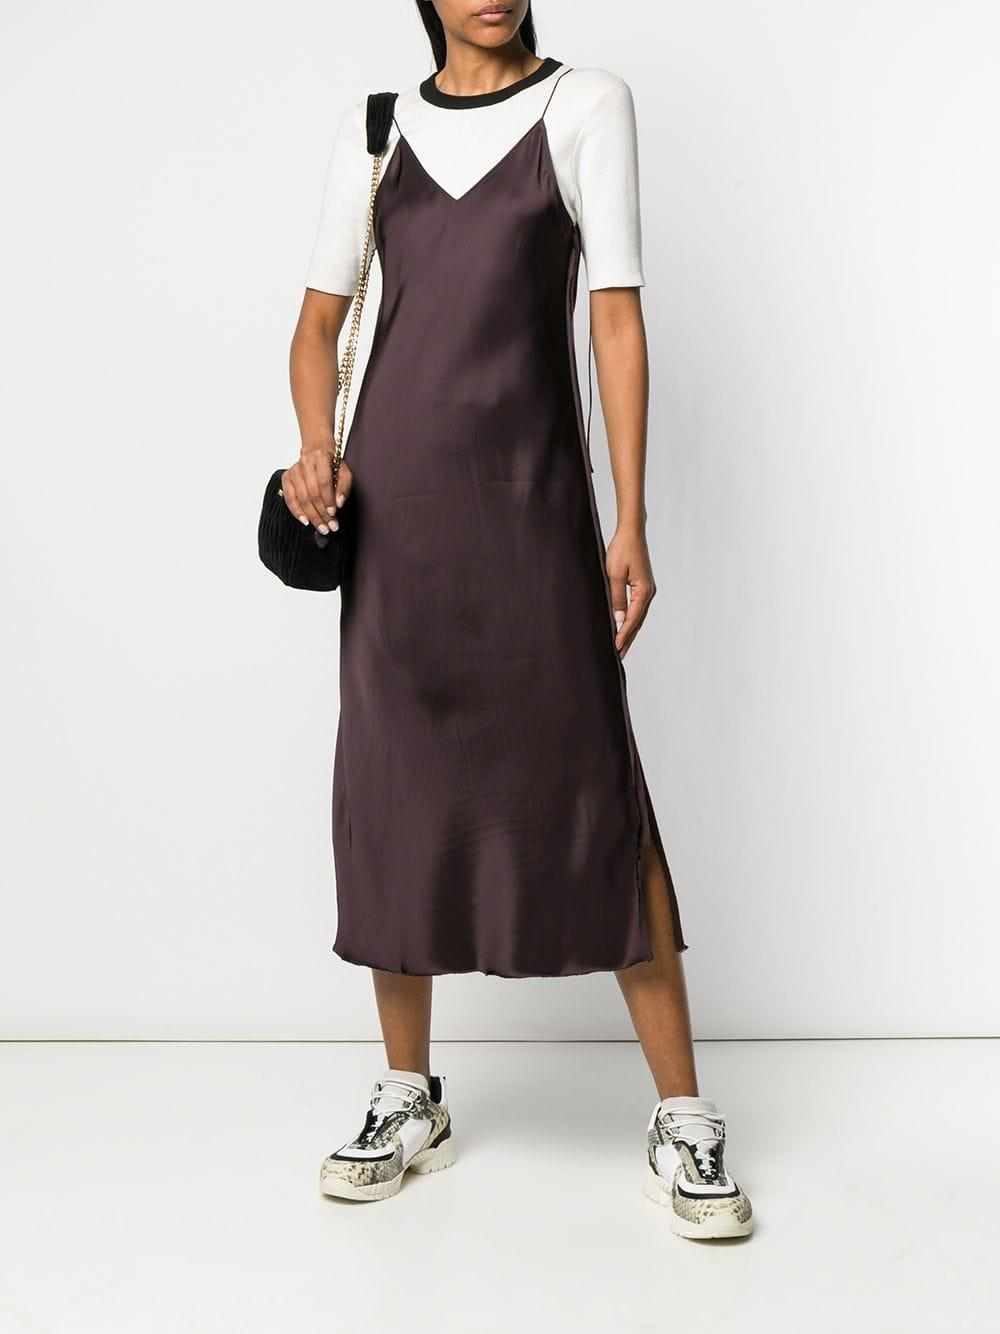 5a15c2ffa131 Lyst - Helmut Lang Raw Detail Slip Dress in Brown